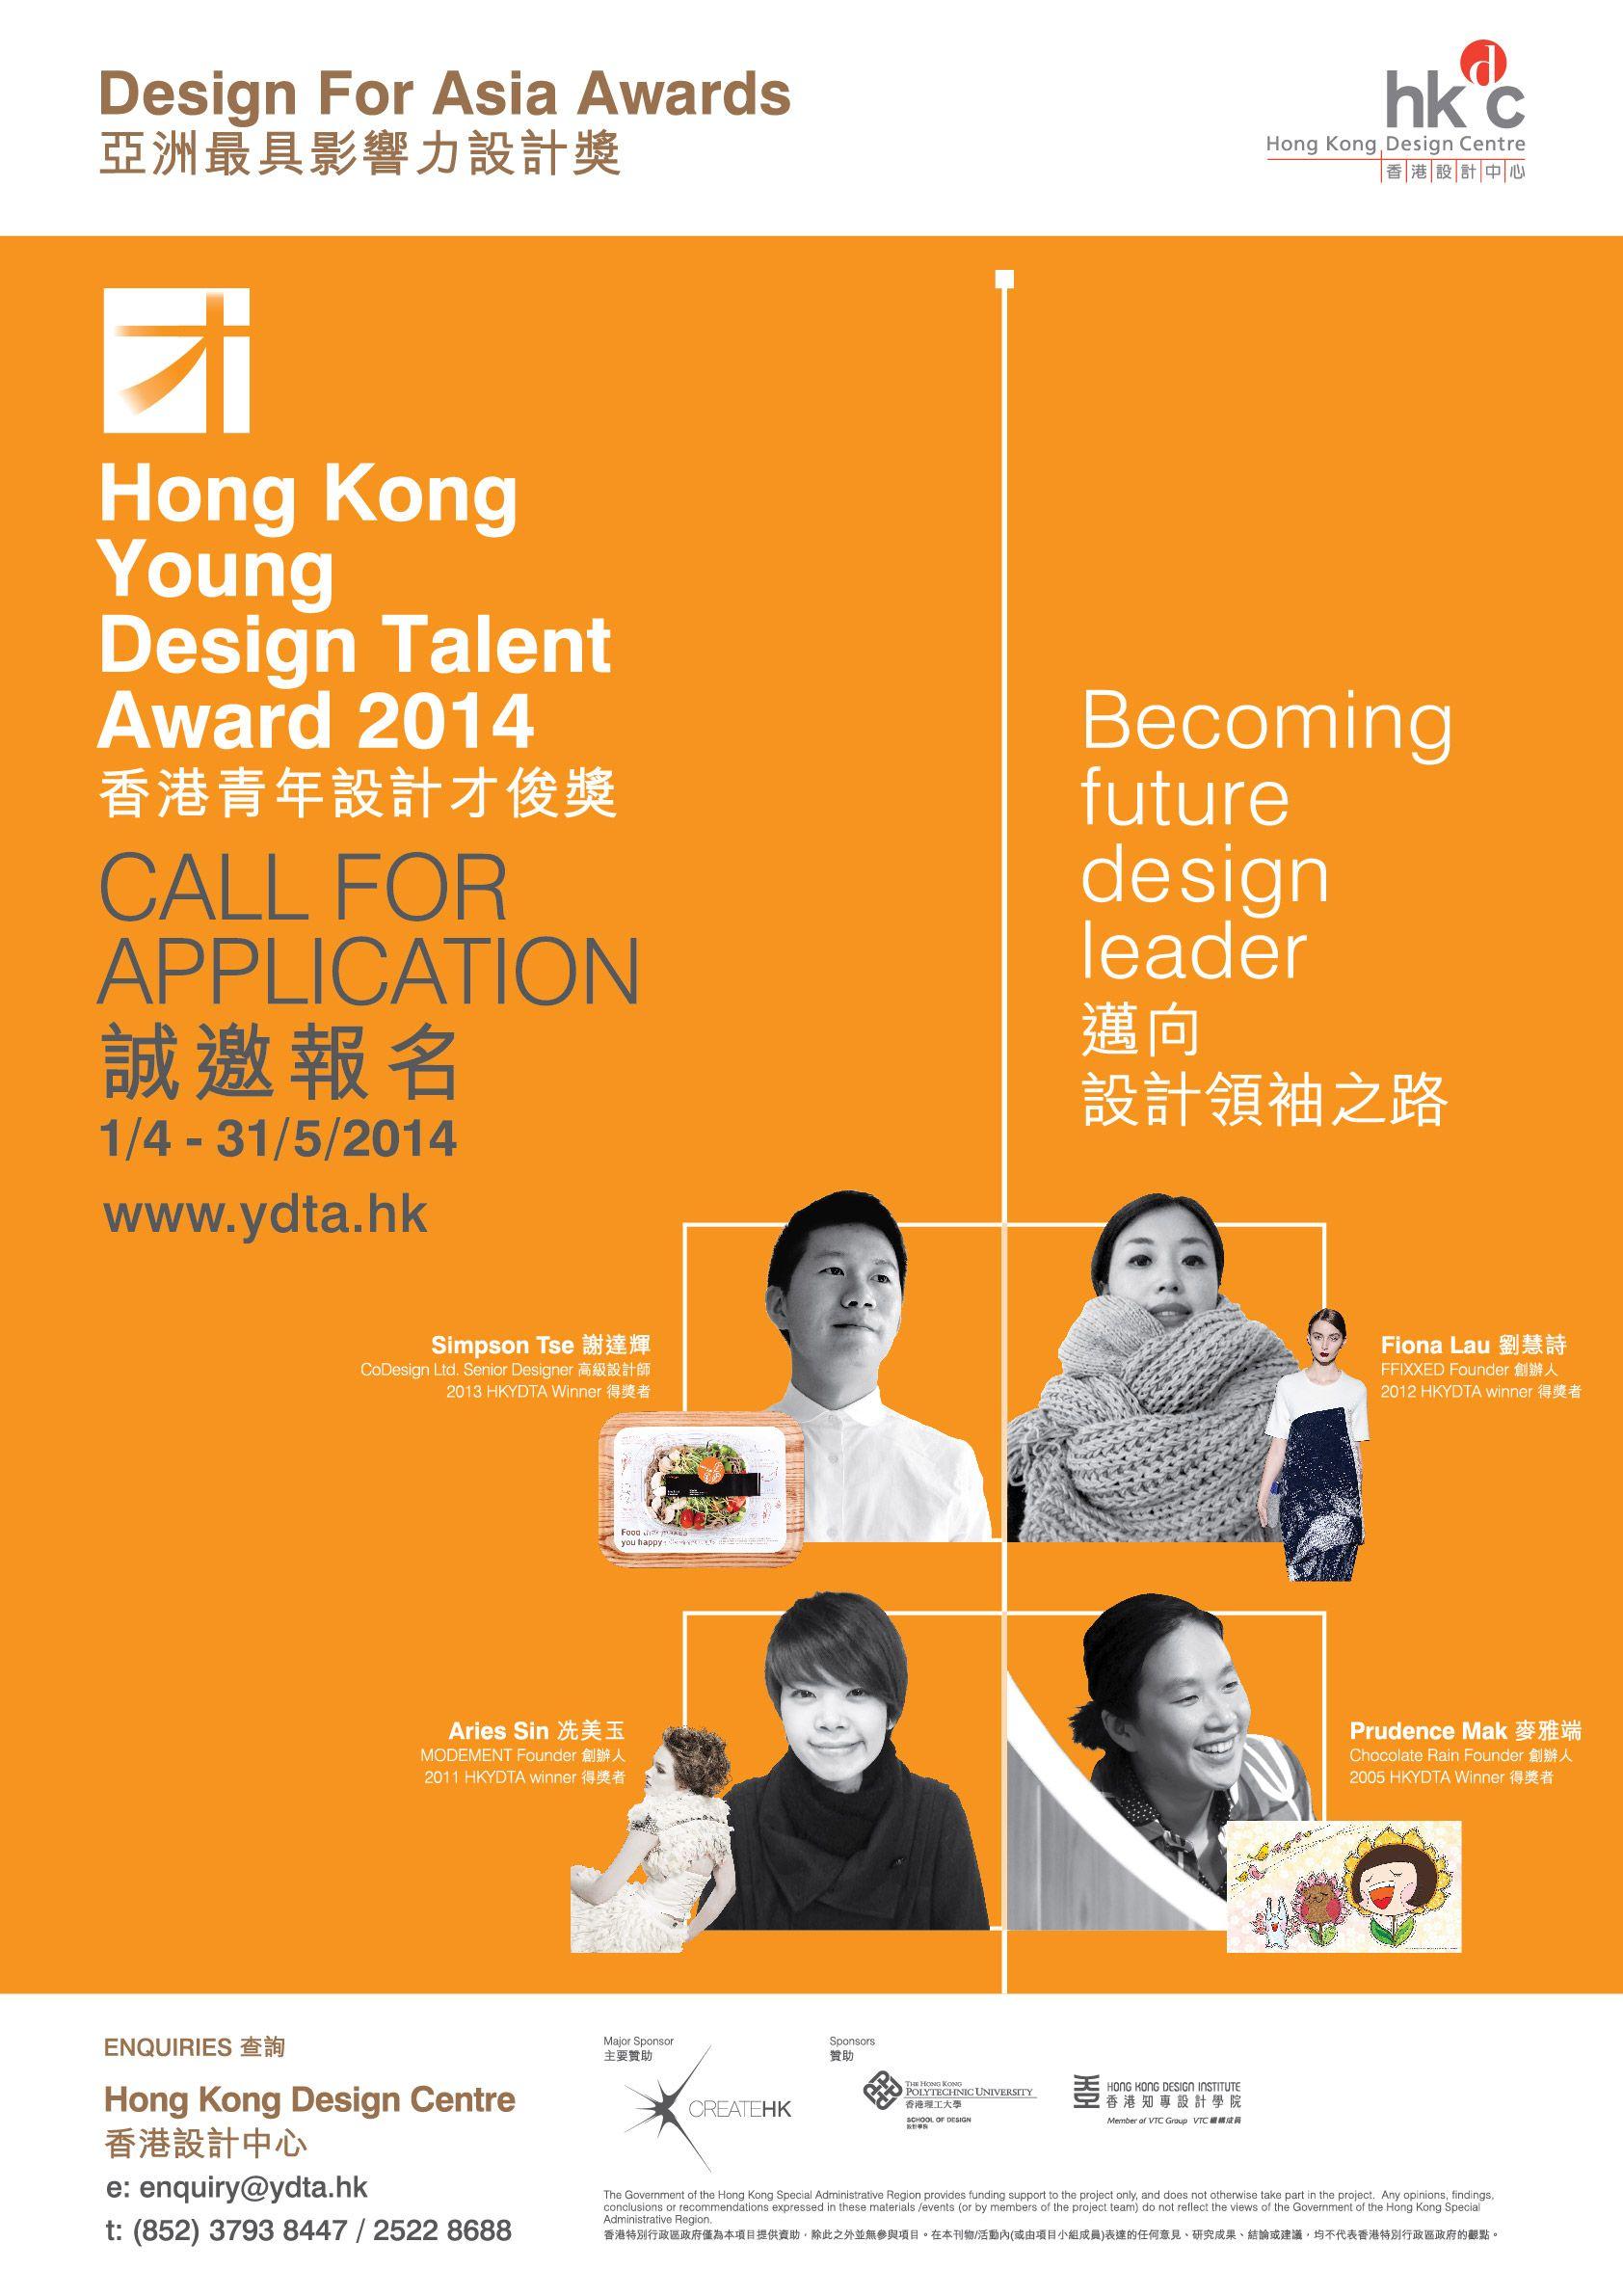 Hong Kong Young Design Talent Award, Call for Application